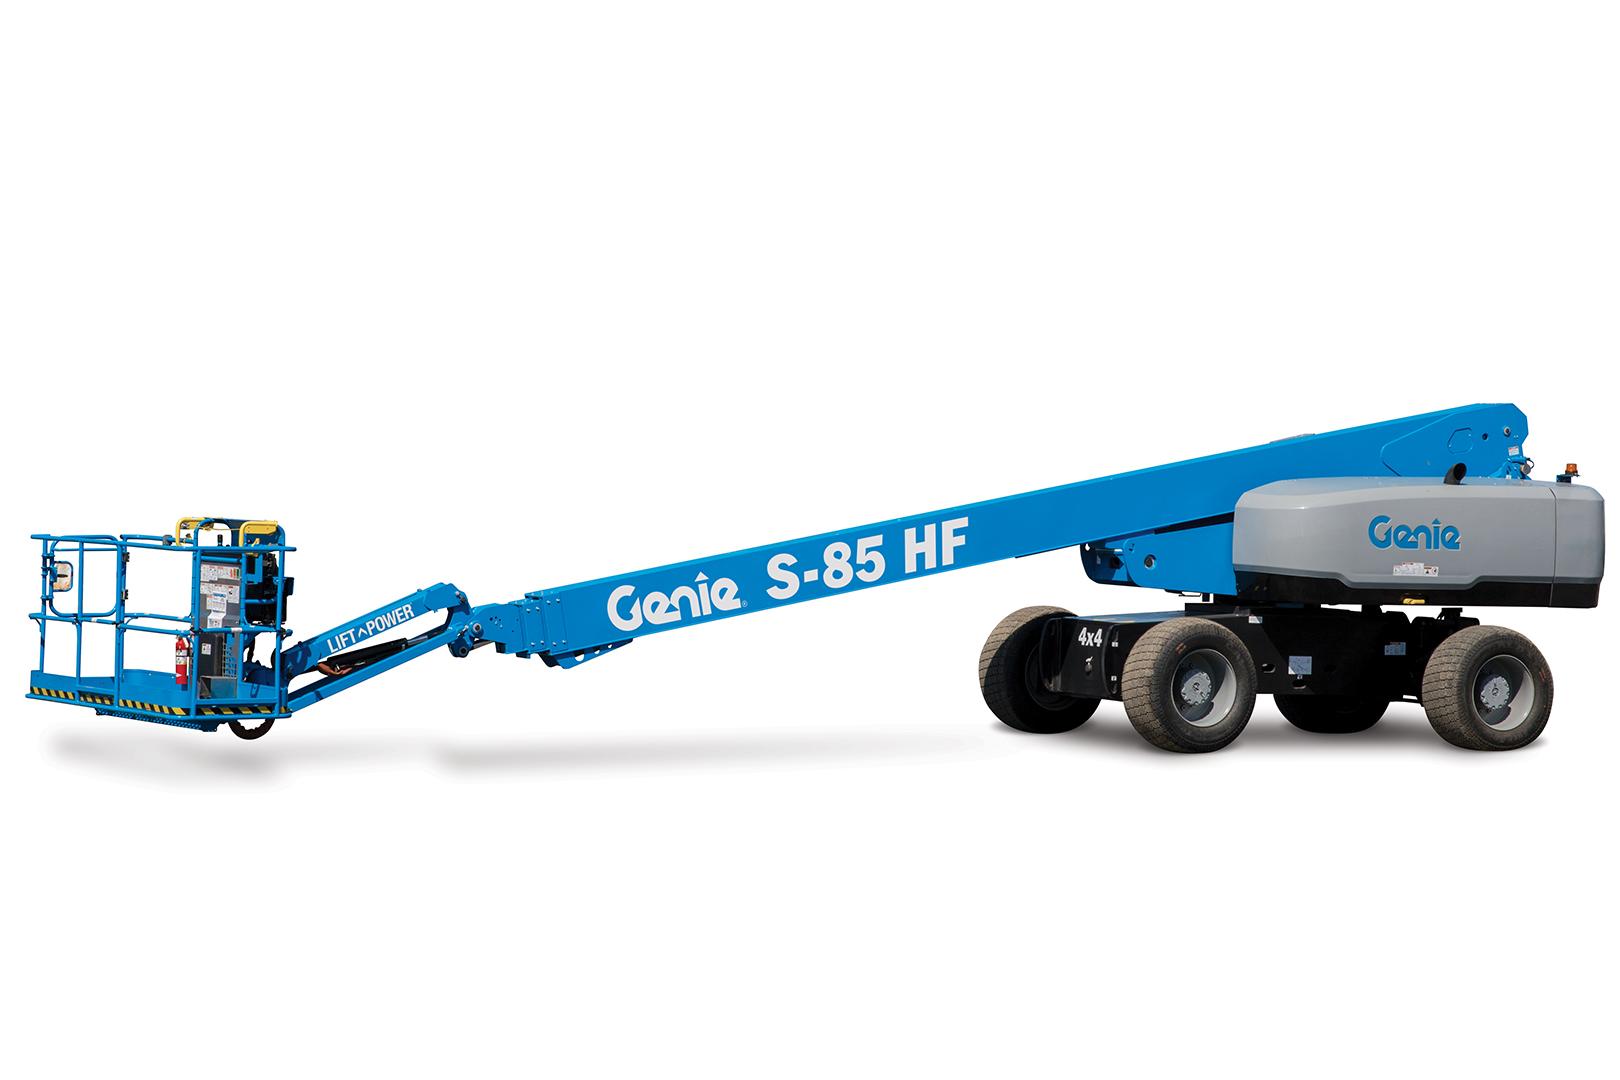 Genie S-80 HF and S-85 HF